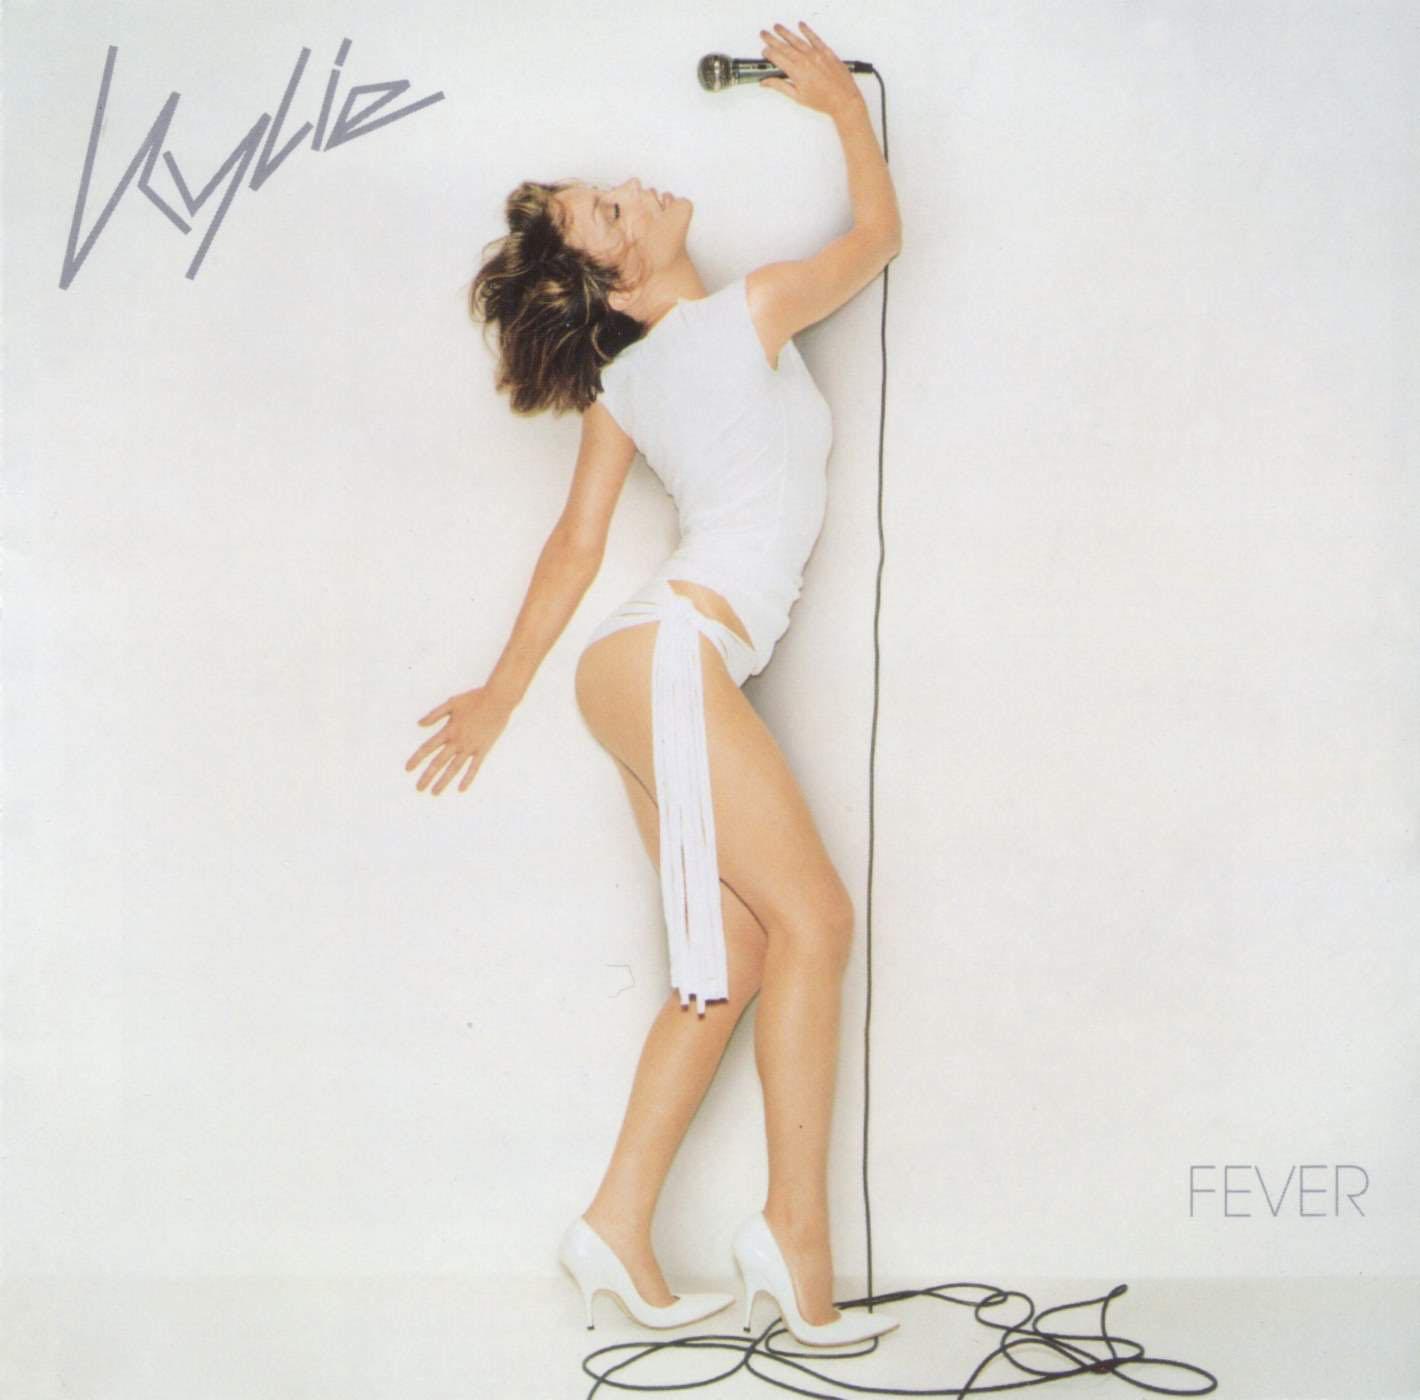 http://4.bp.blogspot.com/-qAjrJJMjhe8/ThLx4n_hgEI/AAAAAAAAA1Q/5OmANxsI6f4/s1600/KylieMinogueOverTheYears13.jpg